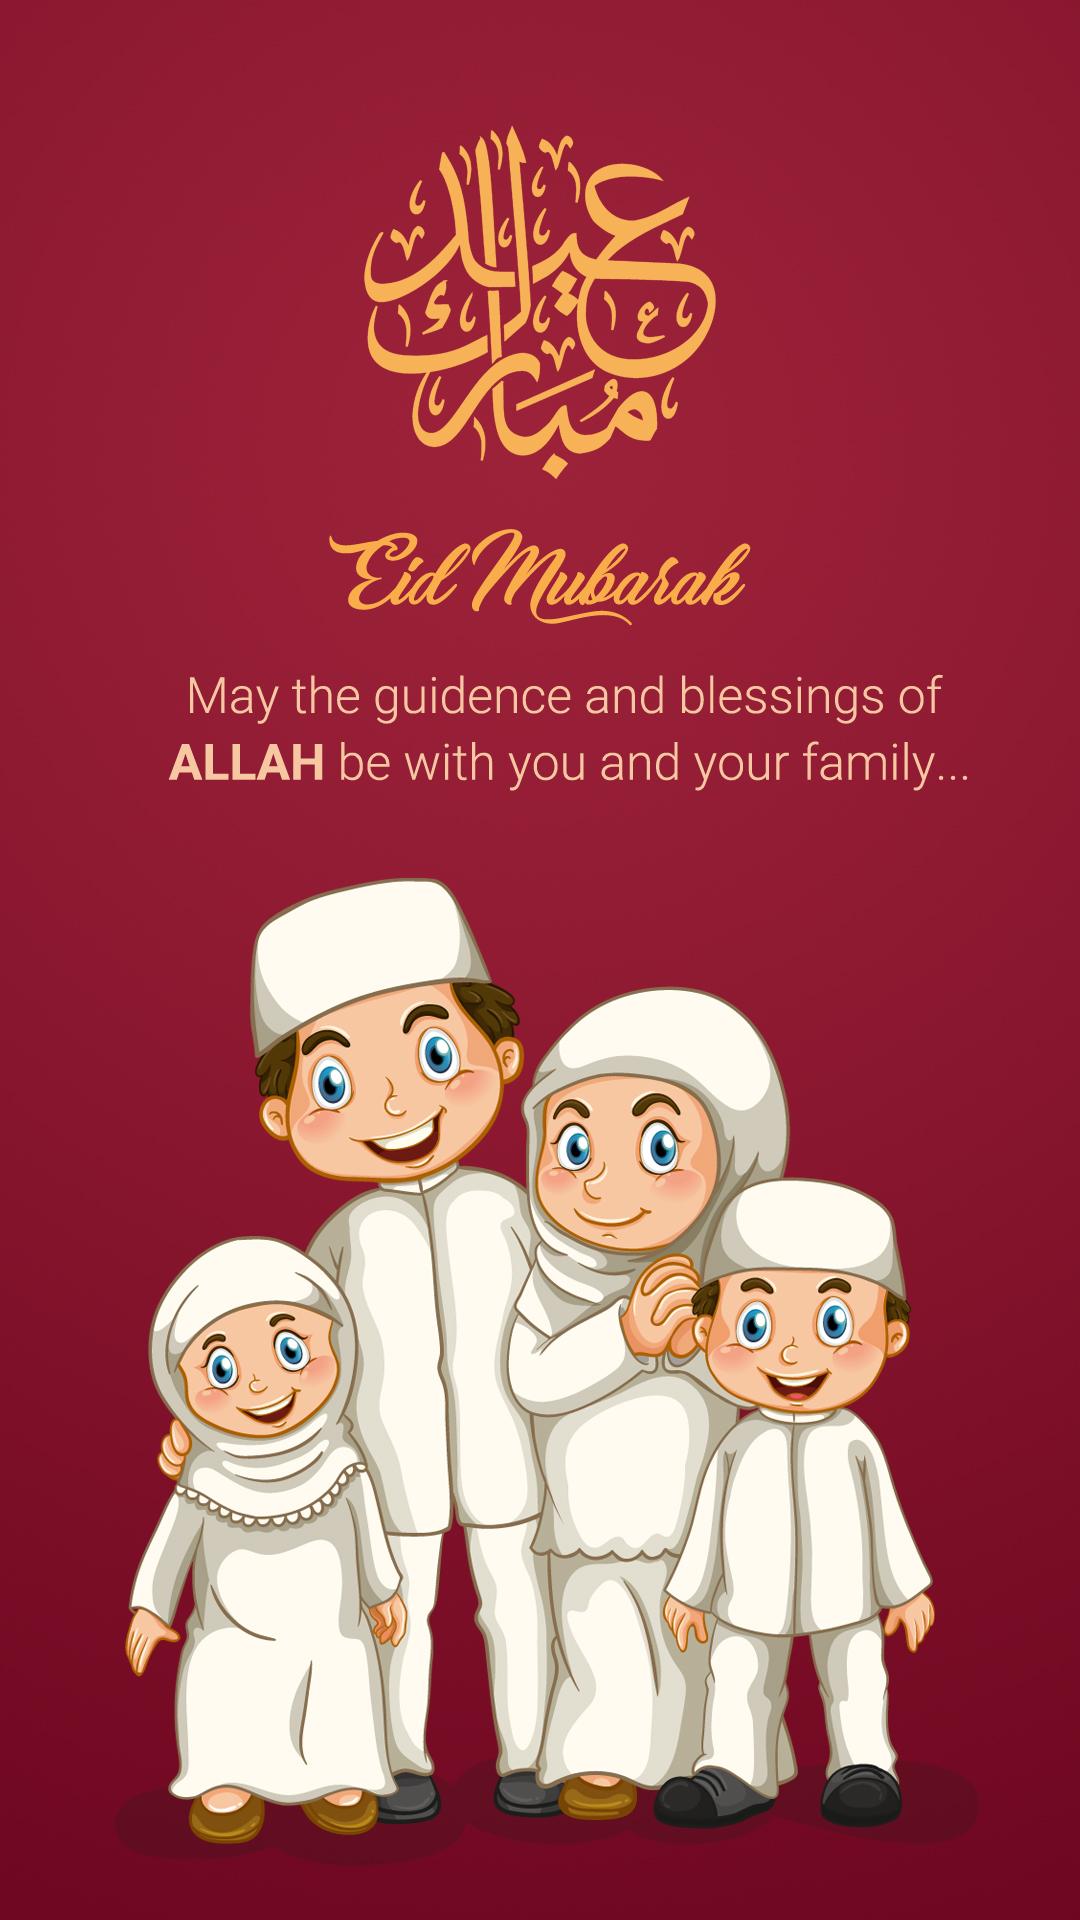 Eid Coming Soon Wallpaper 1080x1920 Wallpaper Teahub Io